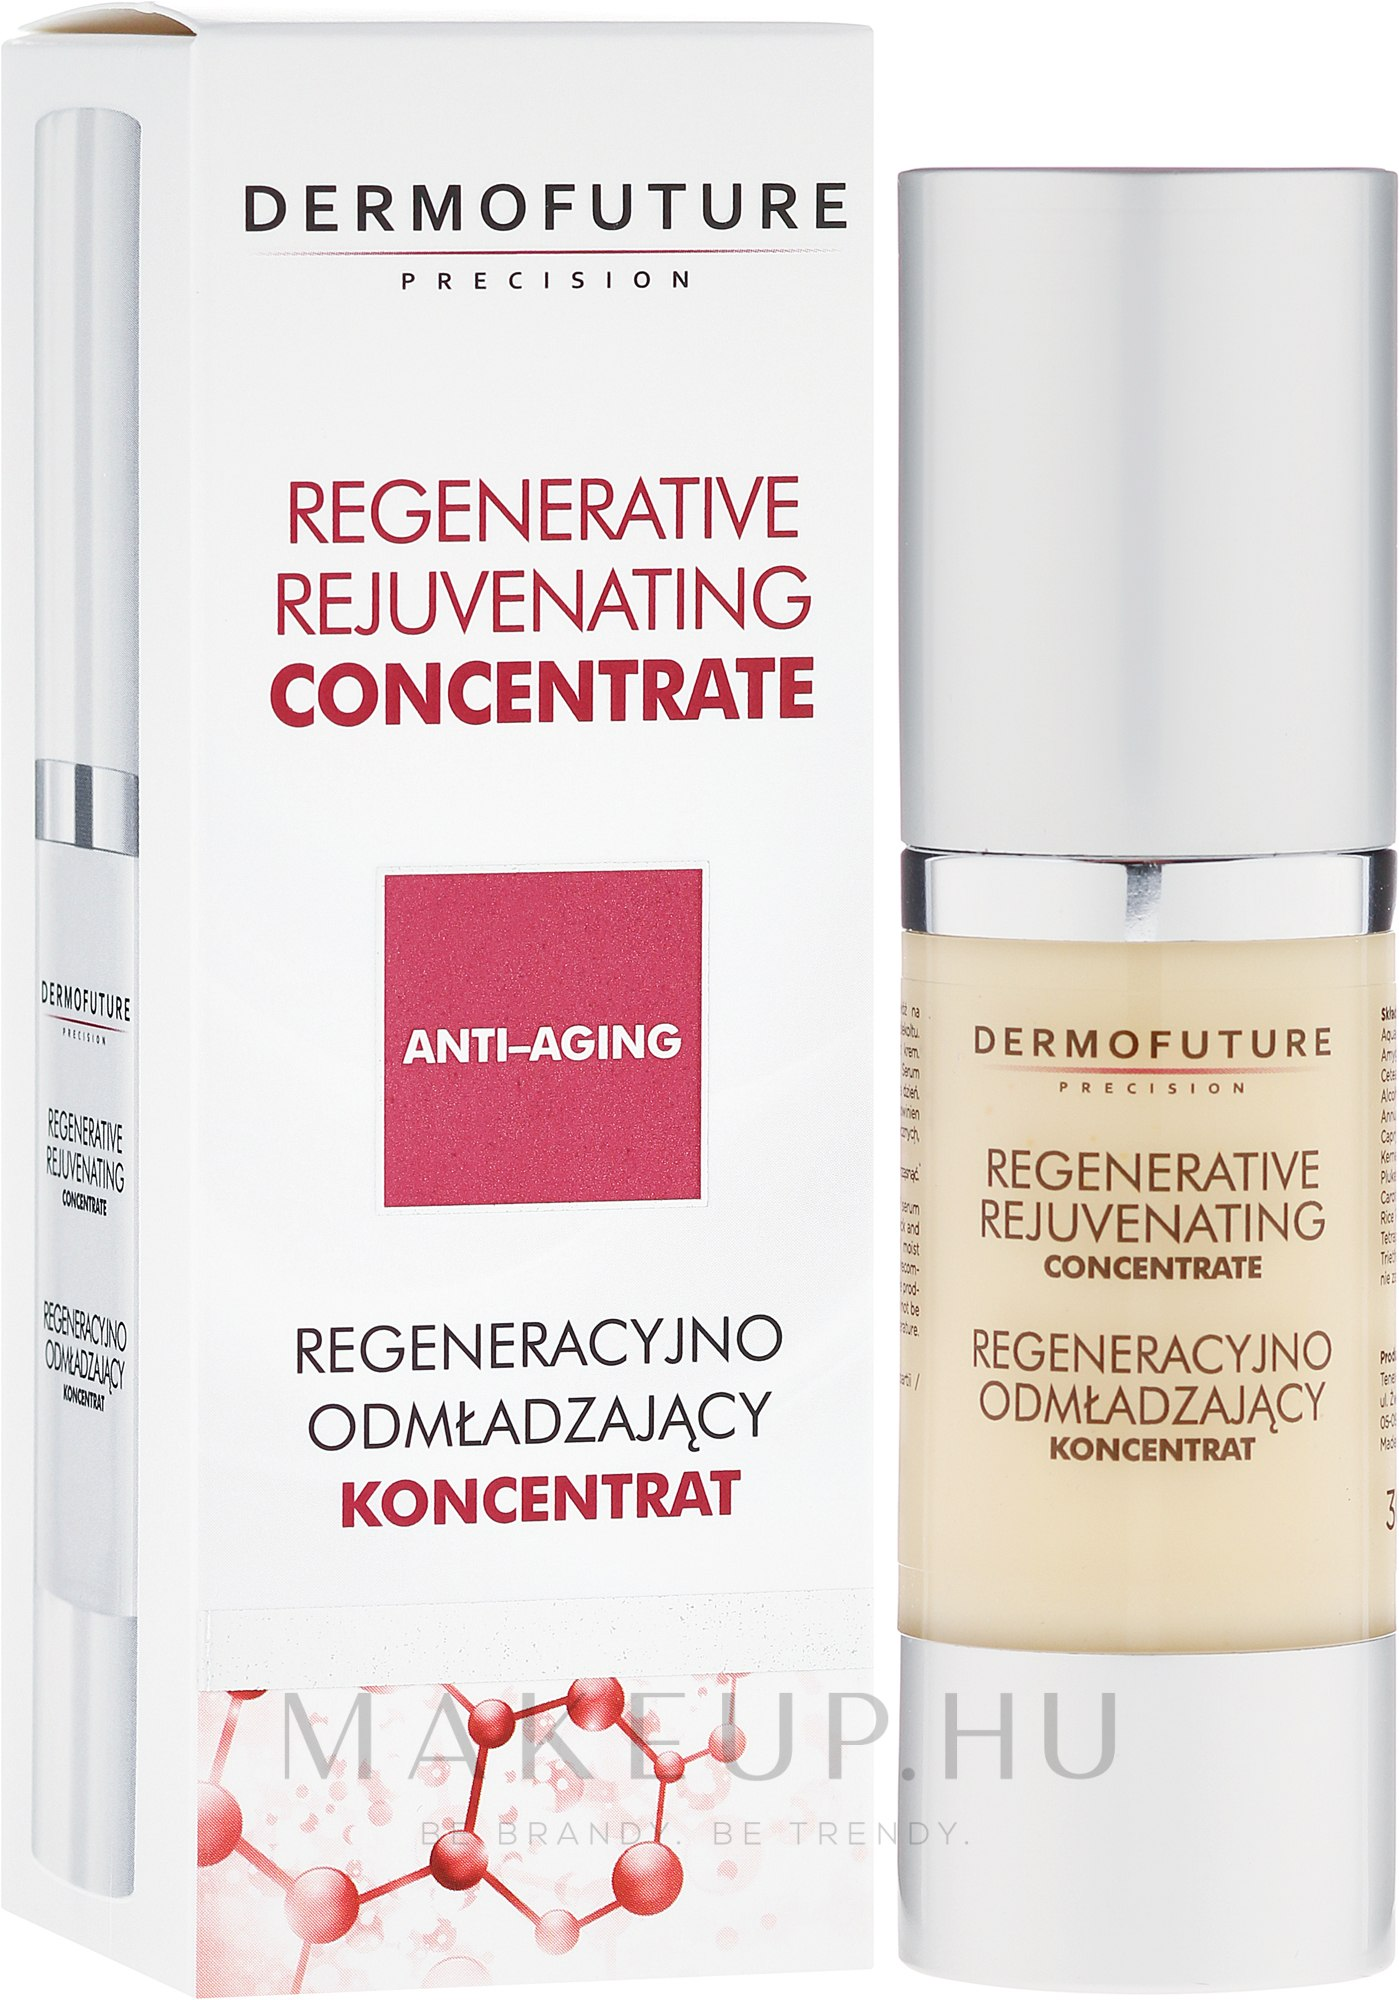 Regeneráló fiatalító koncentrátum retinollal - DermoFuture Regenerative Rejuvenating Concentrate — fotó 30 ml